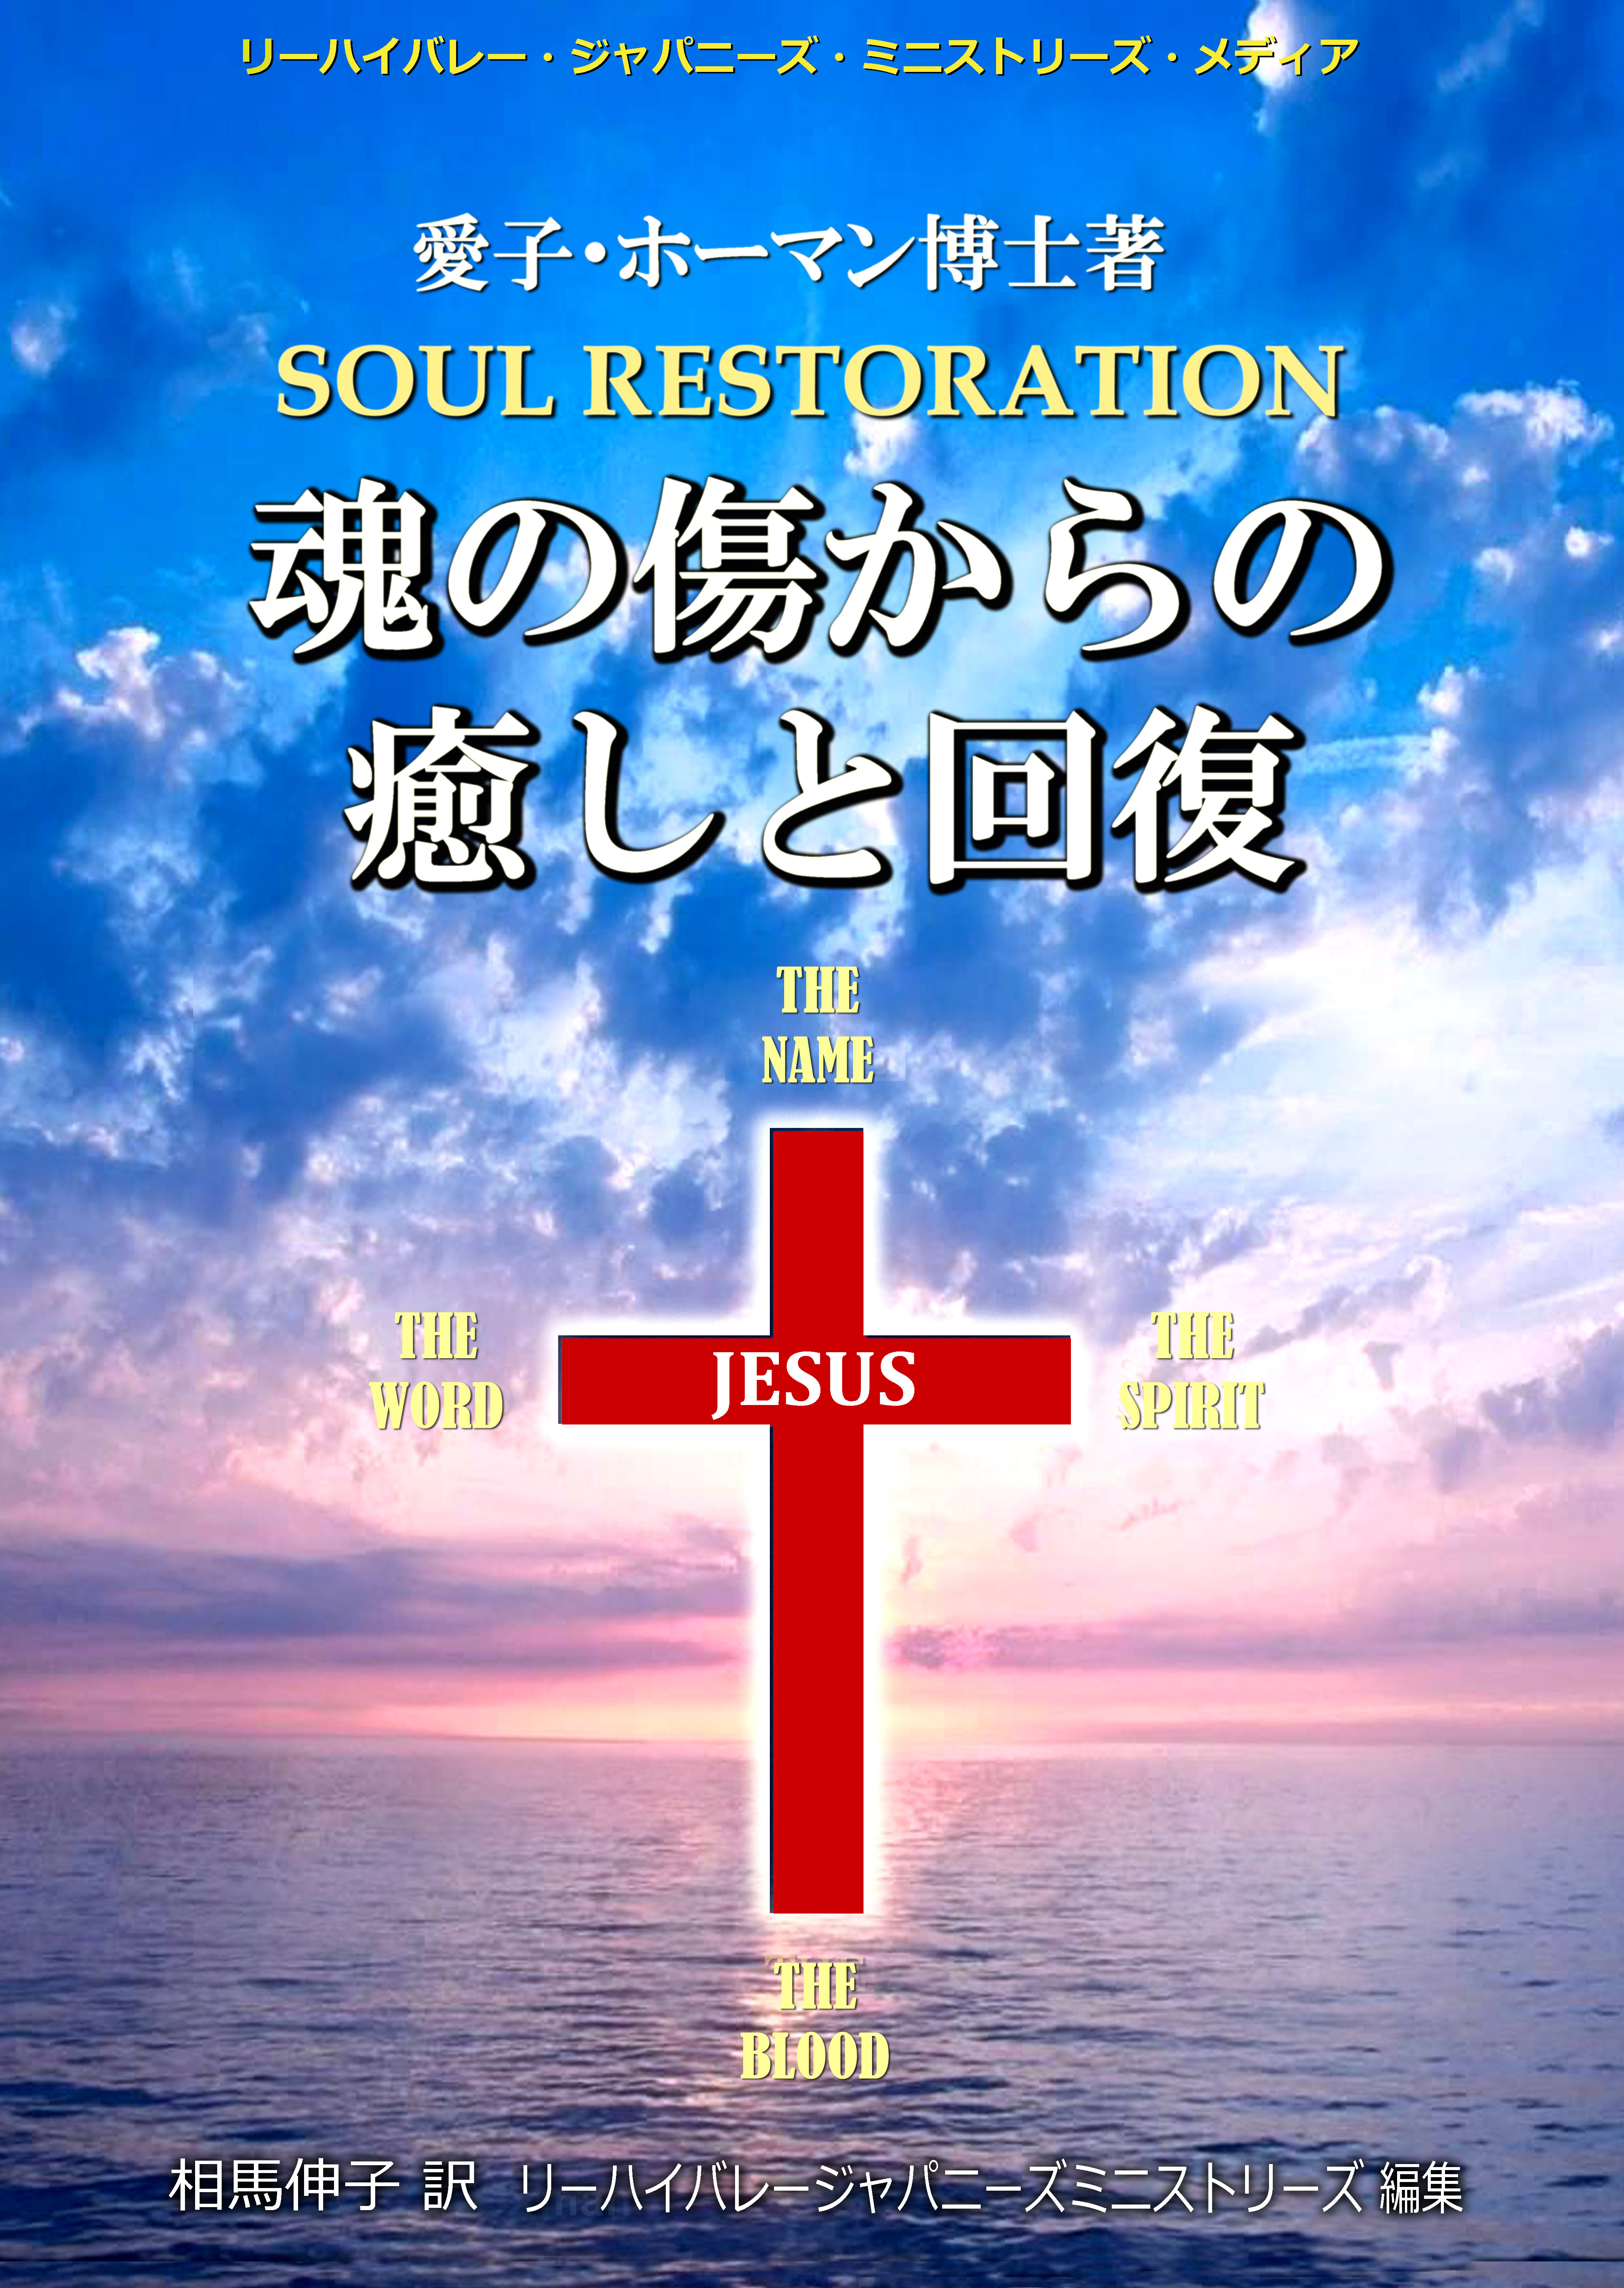 SourRestoration_jp_s